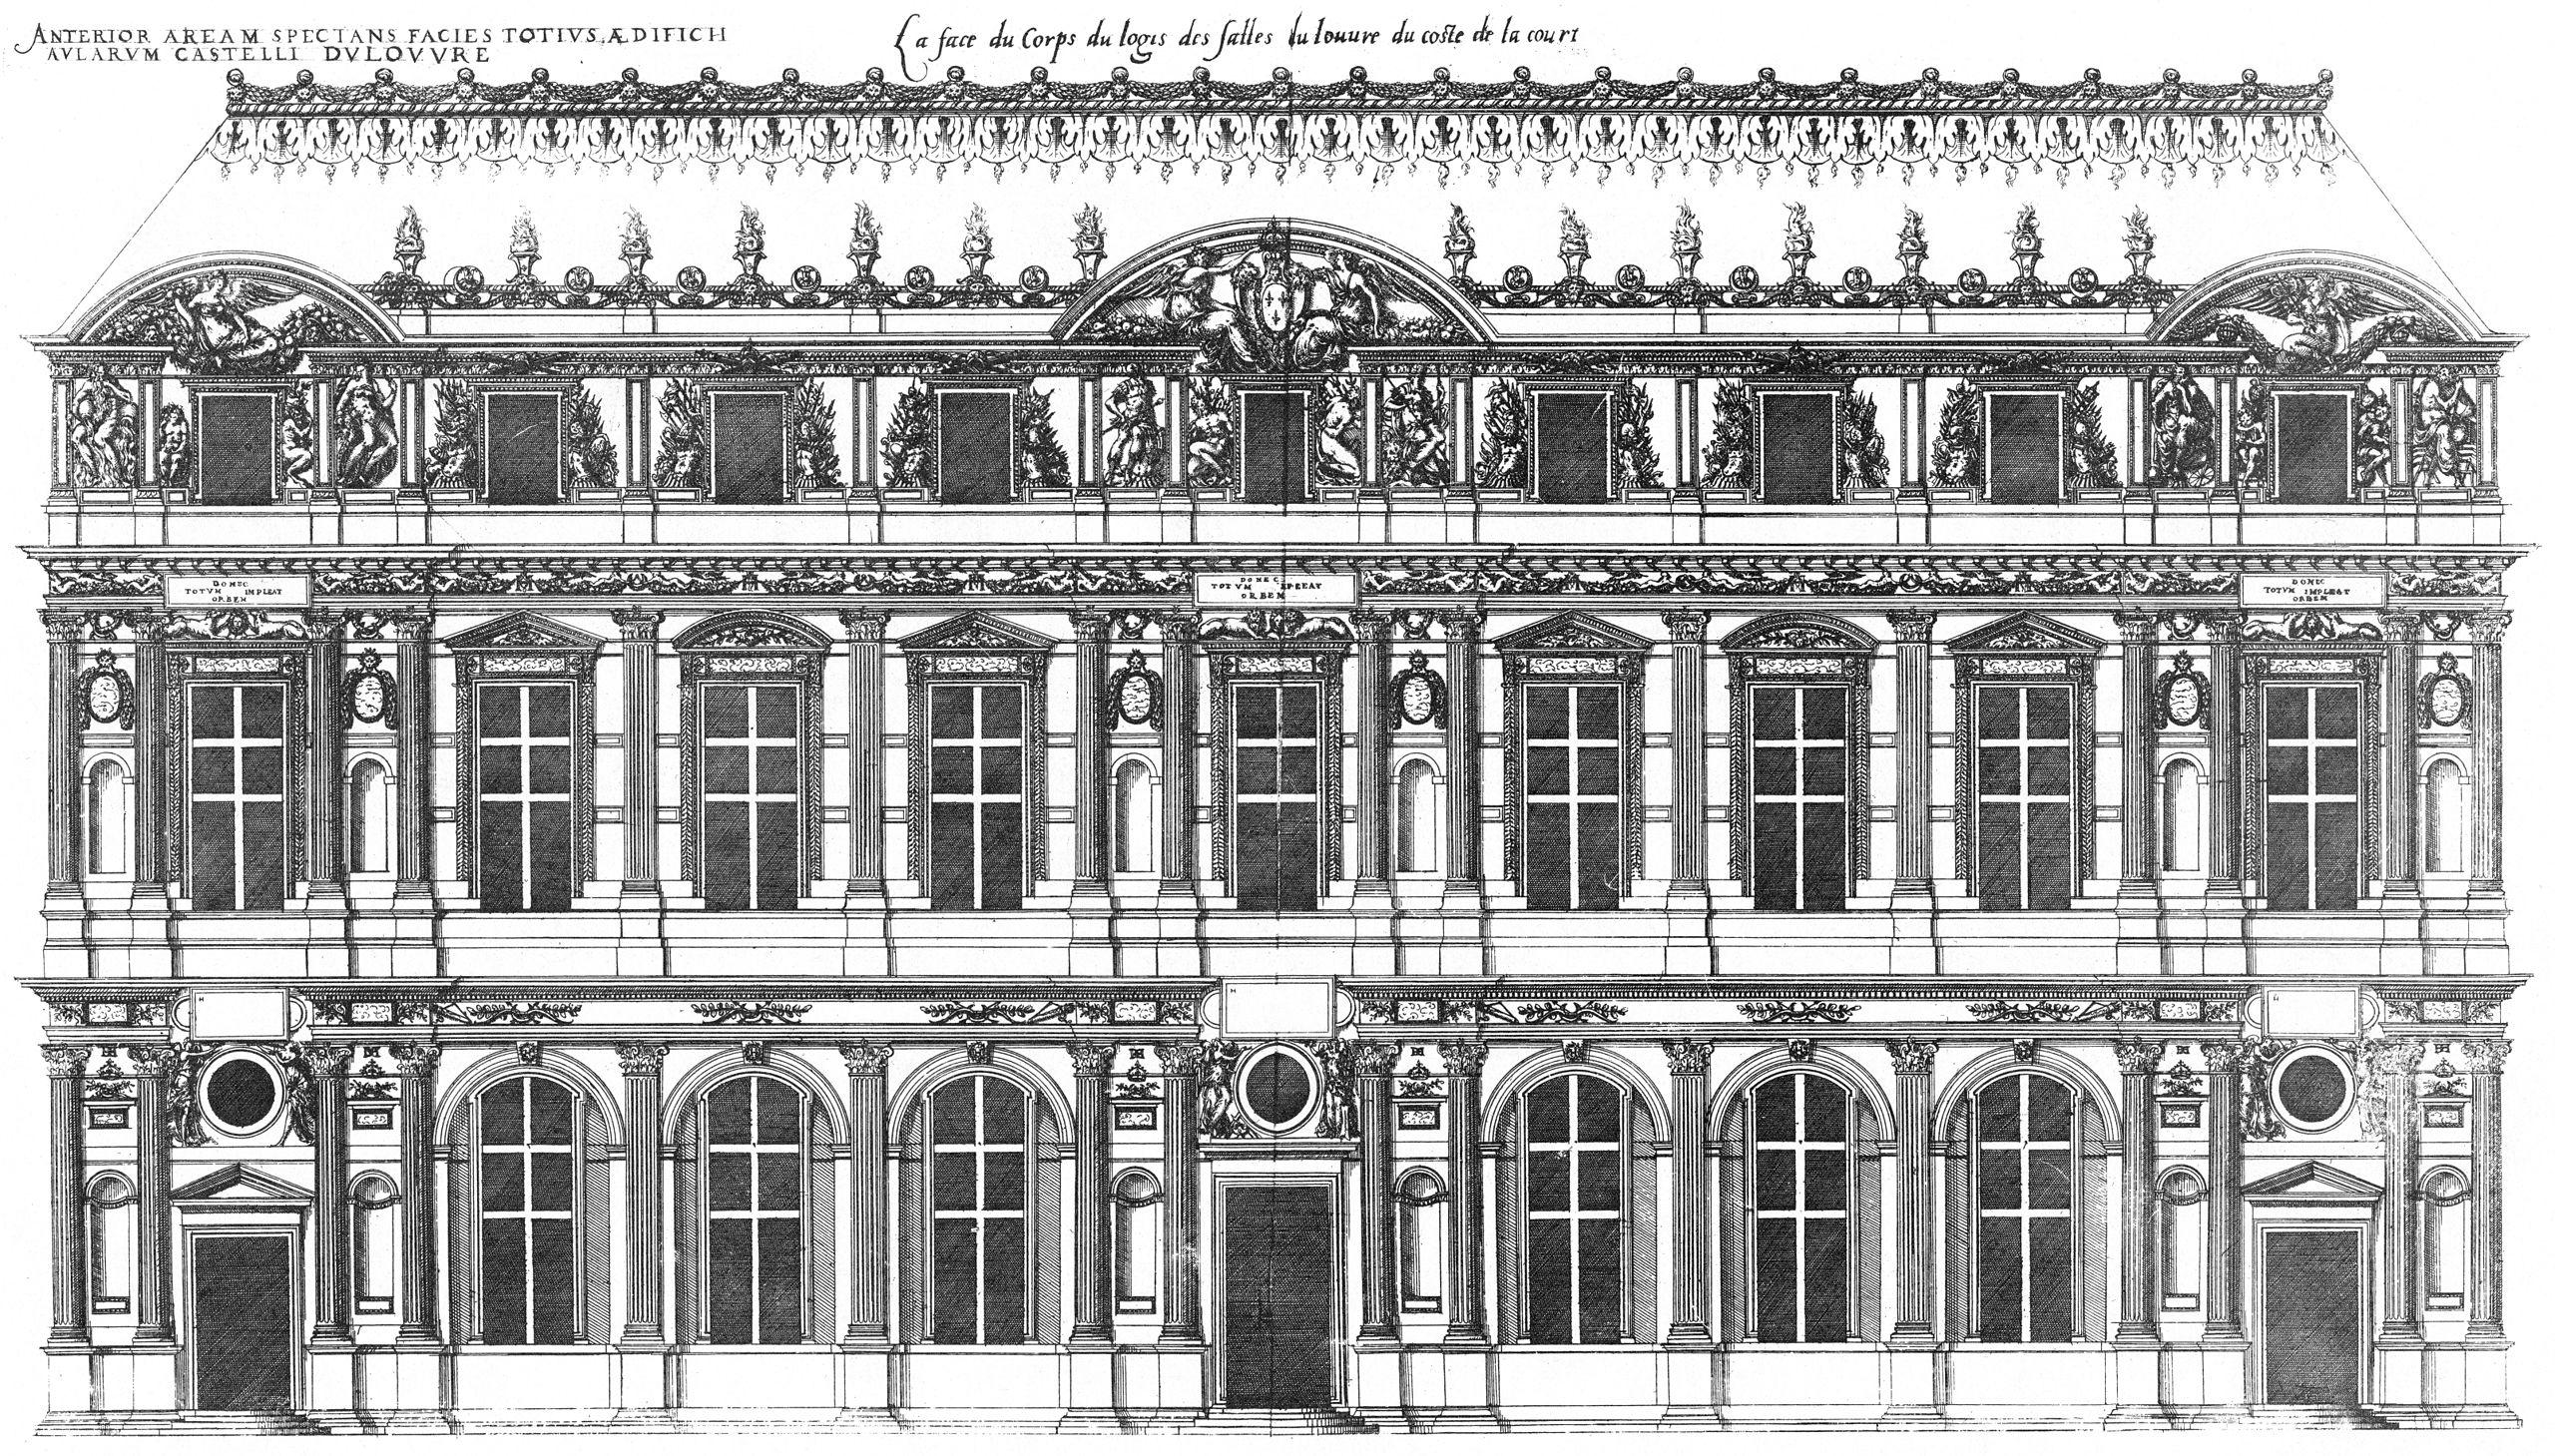 Bastiments v1 (Gregg 1972 p20) - Louvre west wing court facade.jpg